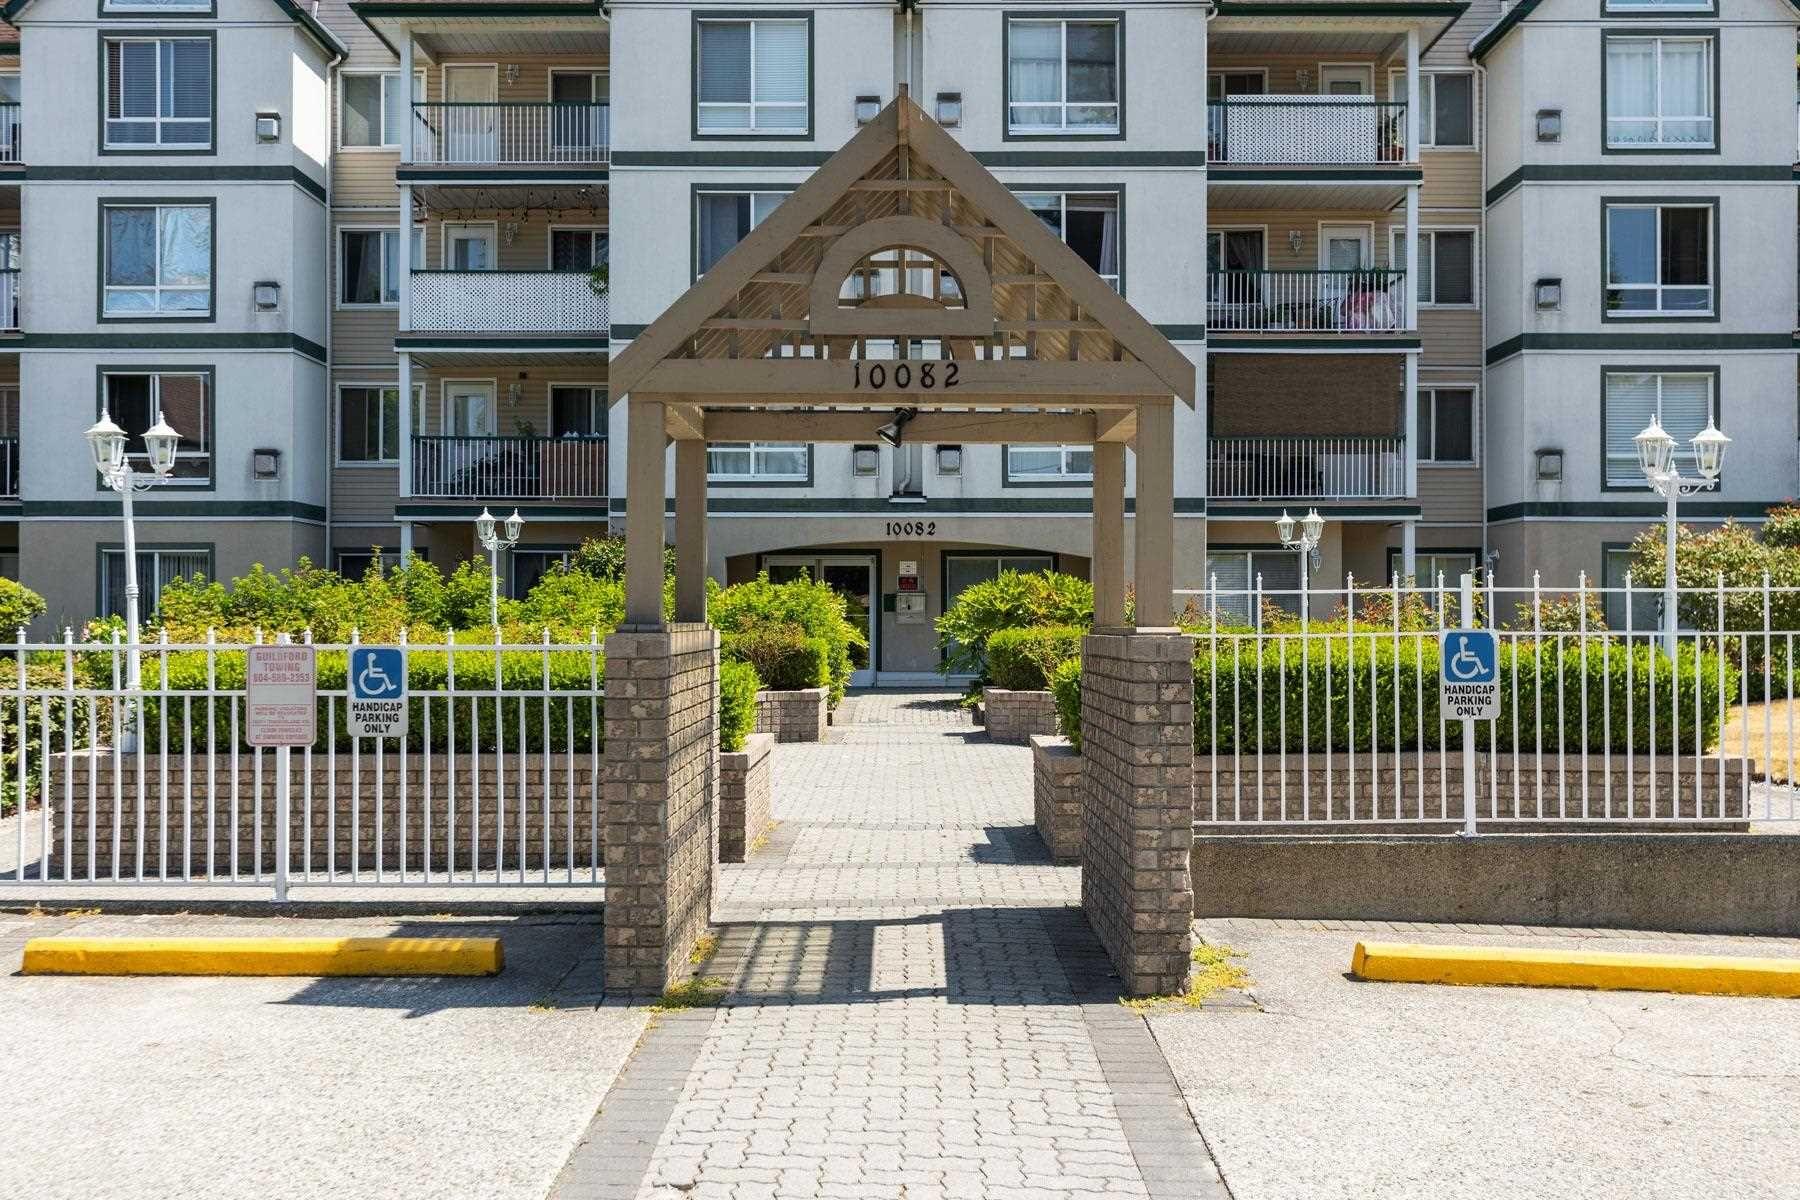 Main Photo: 312 10082 132 Street in Surrey: Whalley Condo for sale (North Surrey)  : MLS®# R2602707